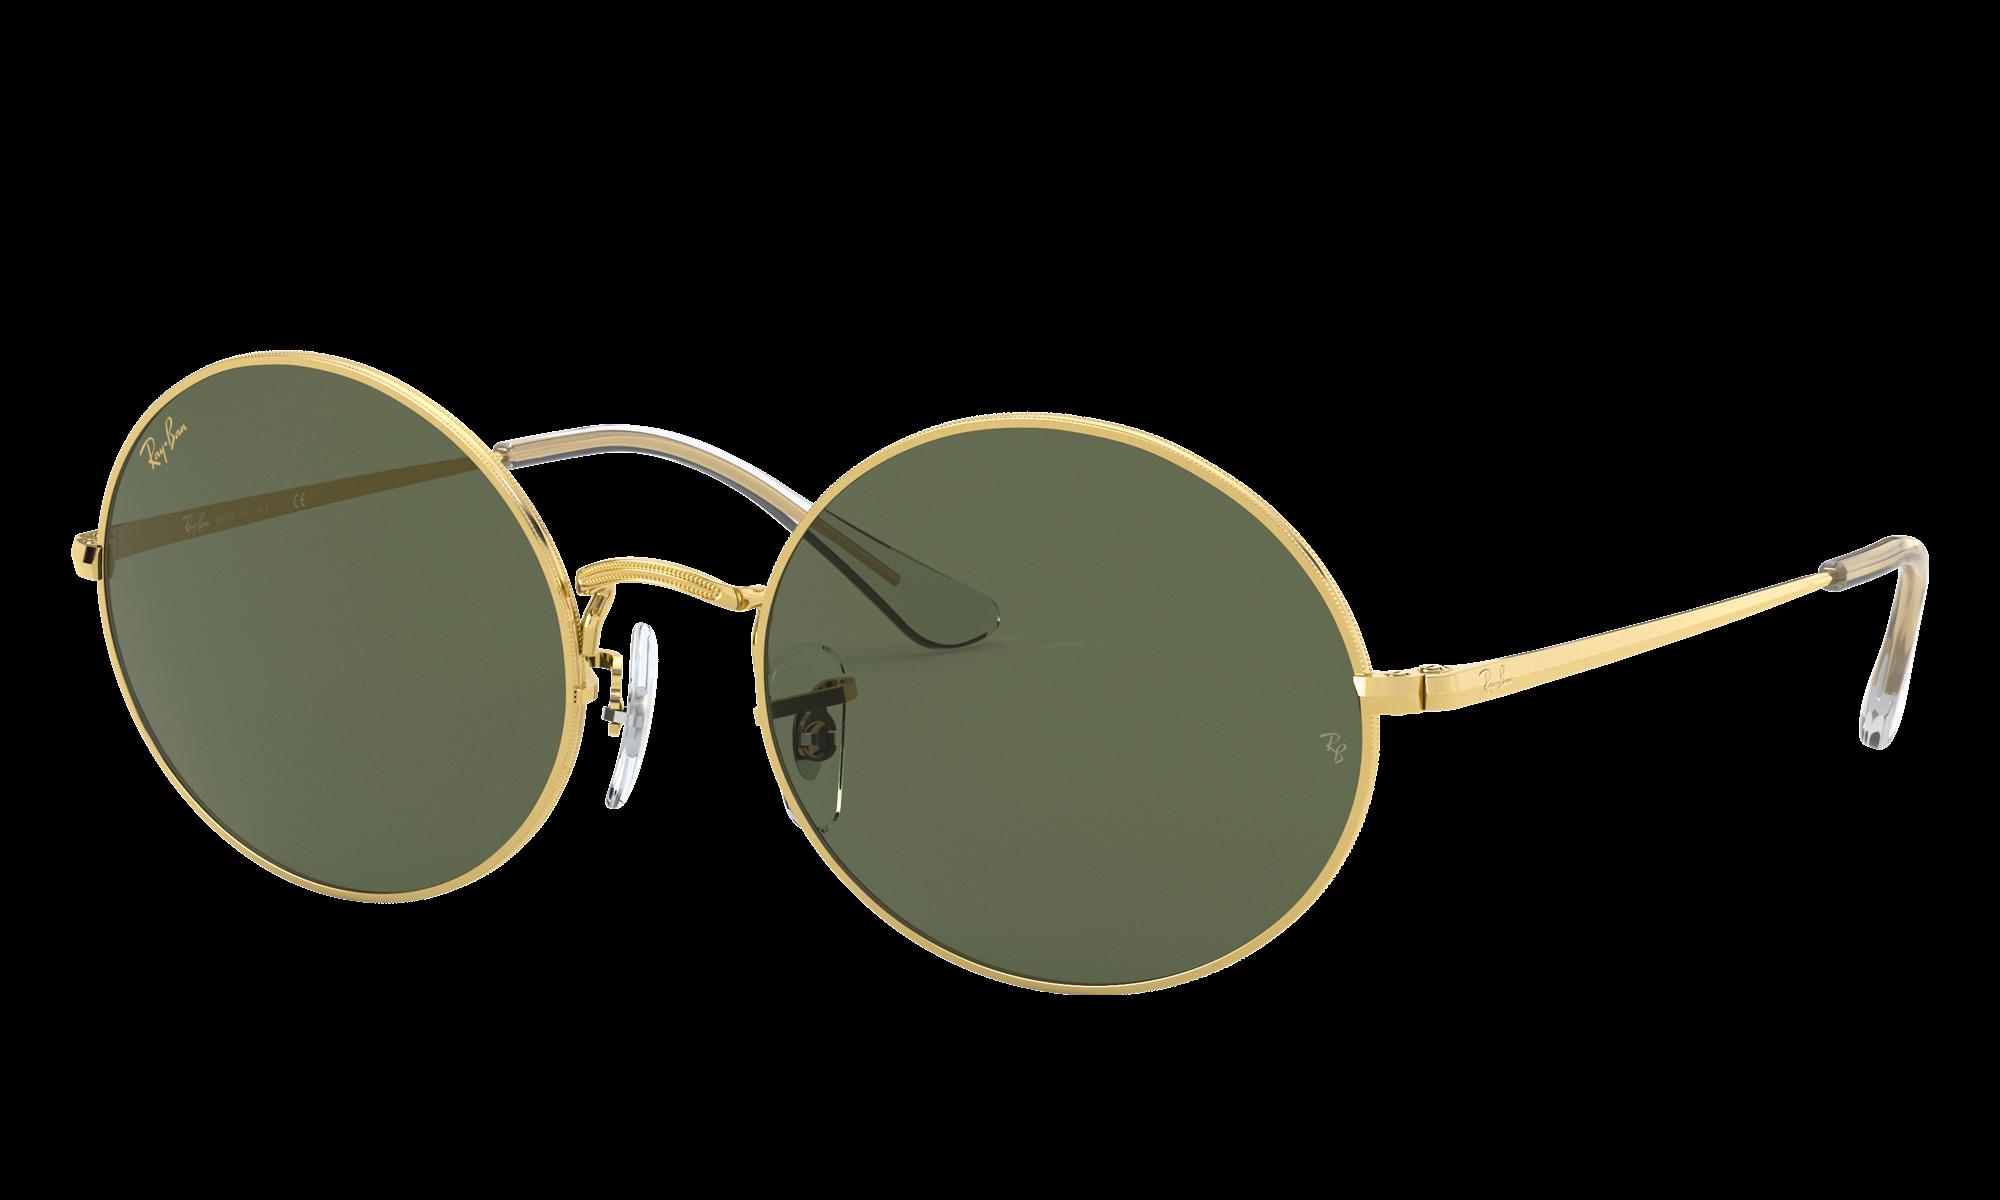 1960s Sunglasses | 70s Sunglasses, 70s Glasses Ray-Ban Unisex Oval 1970 Legend Gold Gold Size Standard $154.00 AT vintagedancer.com